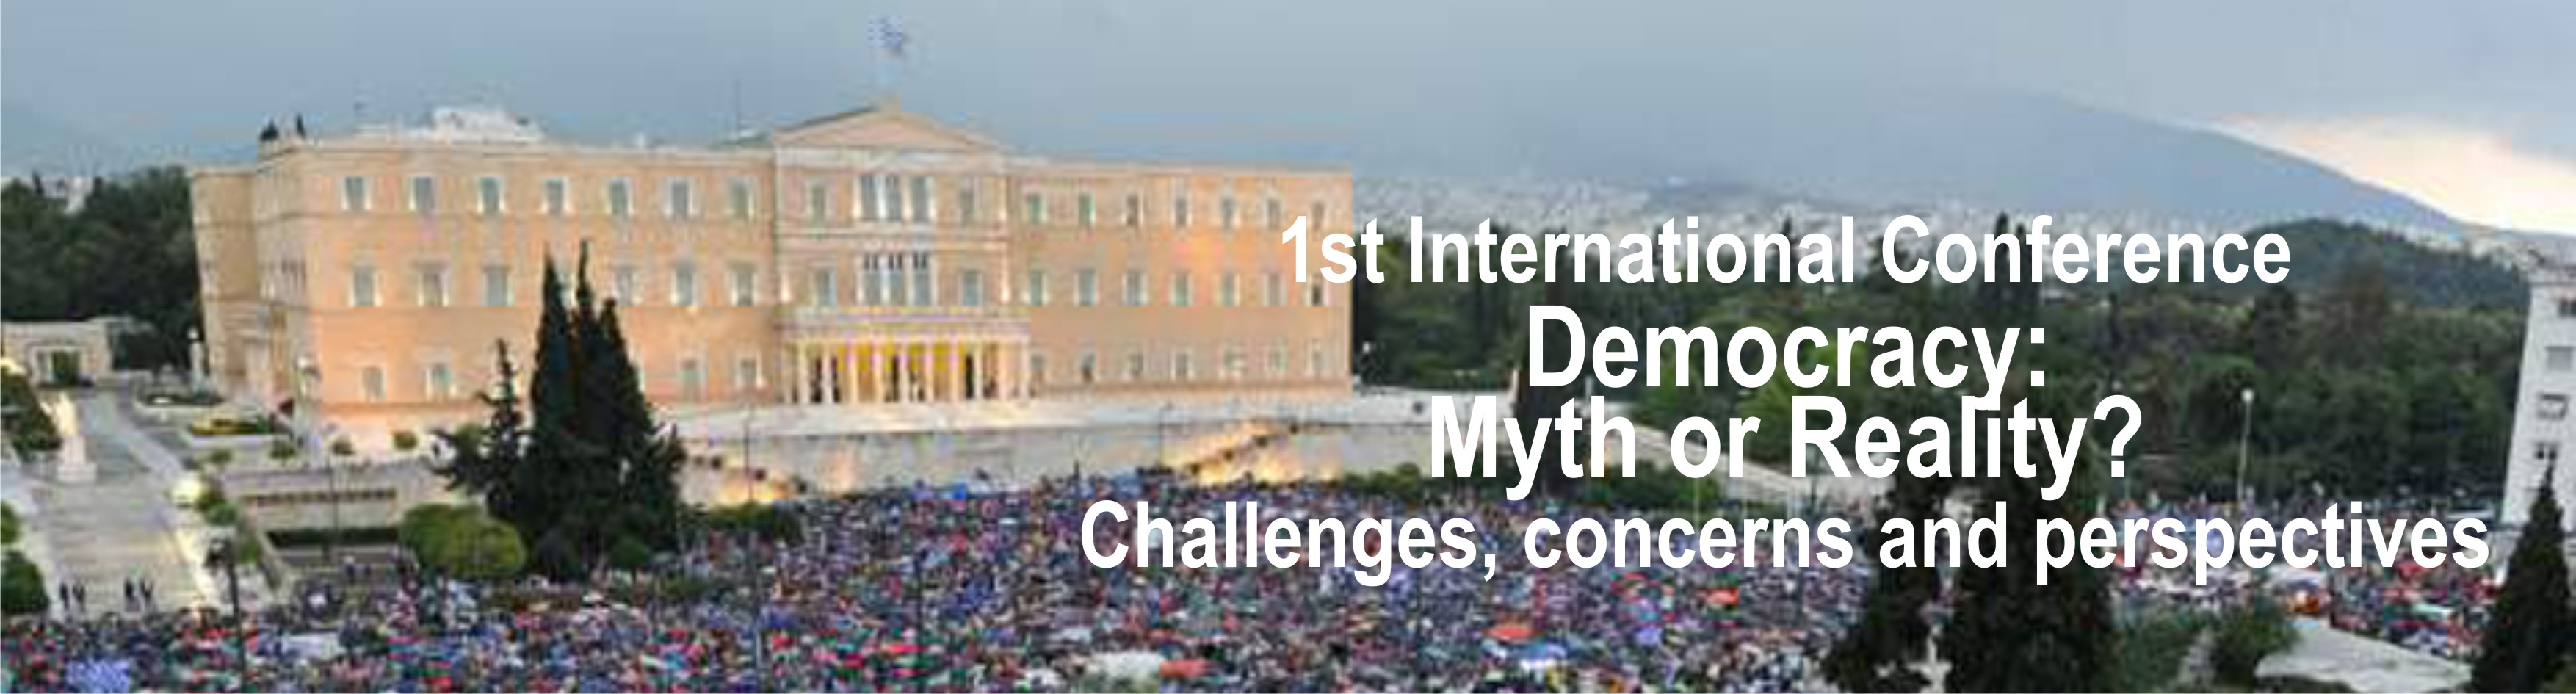 1st International Conference on Democracy